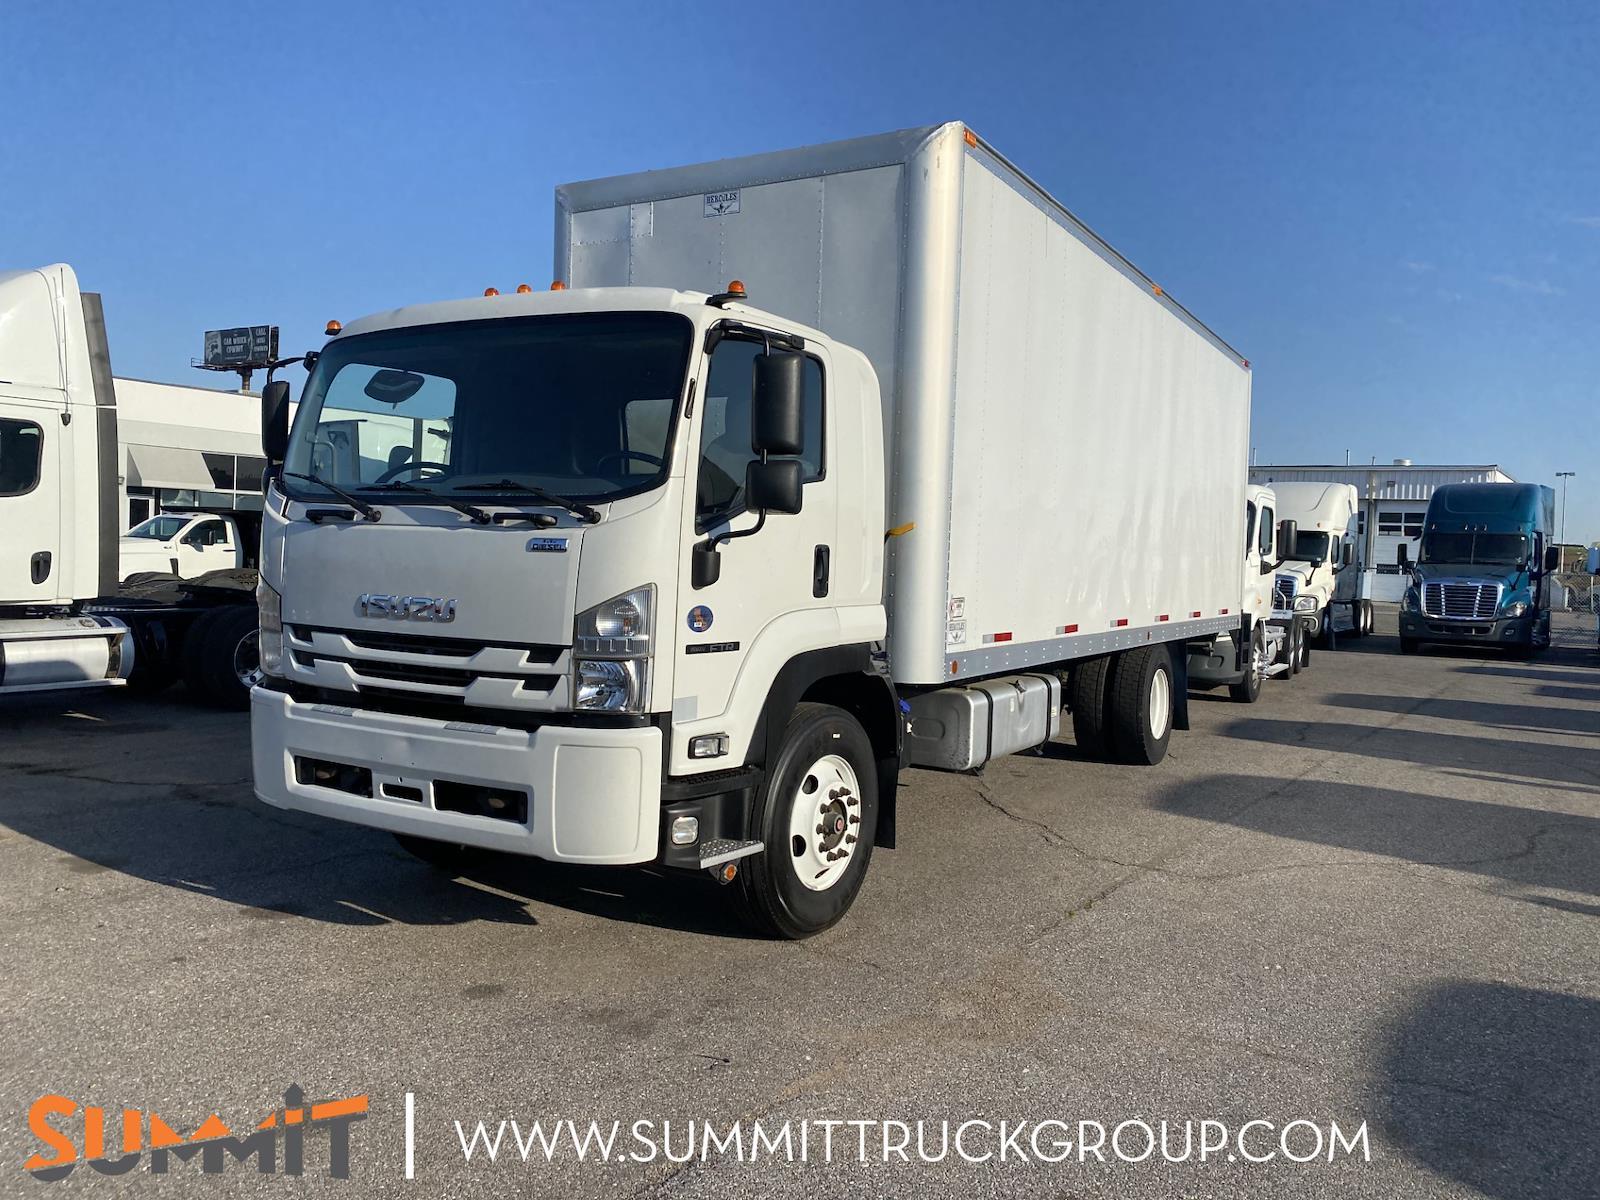 2018 Isuzu FTR Regular Cab 4x2, Dry Freight #160P210511 - photo 1